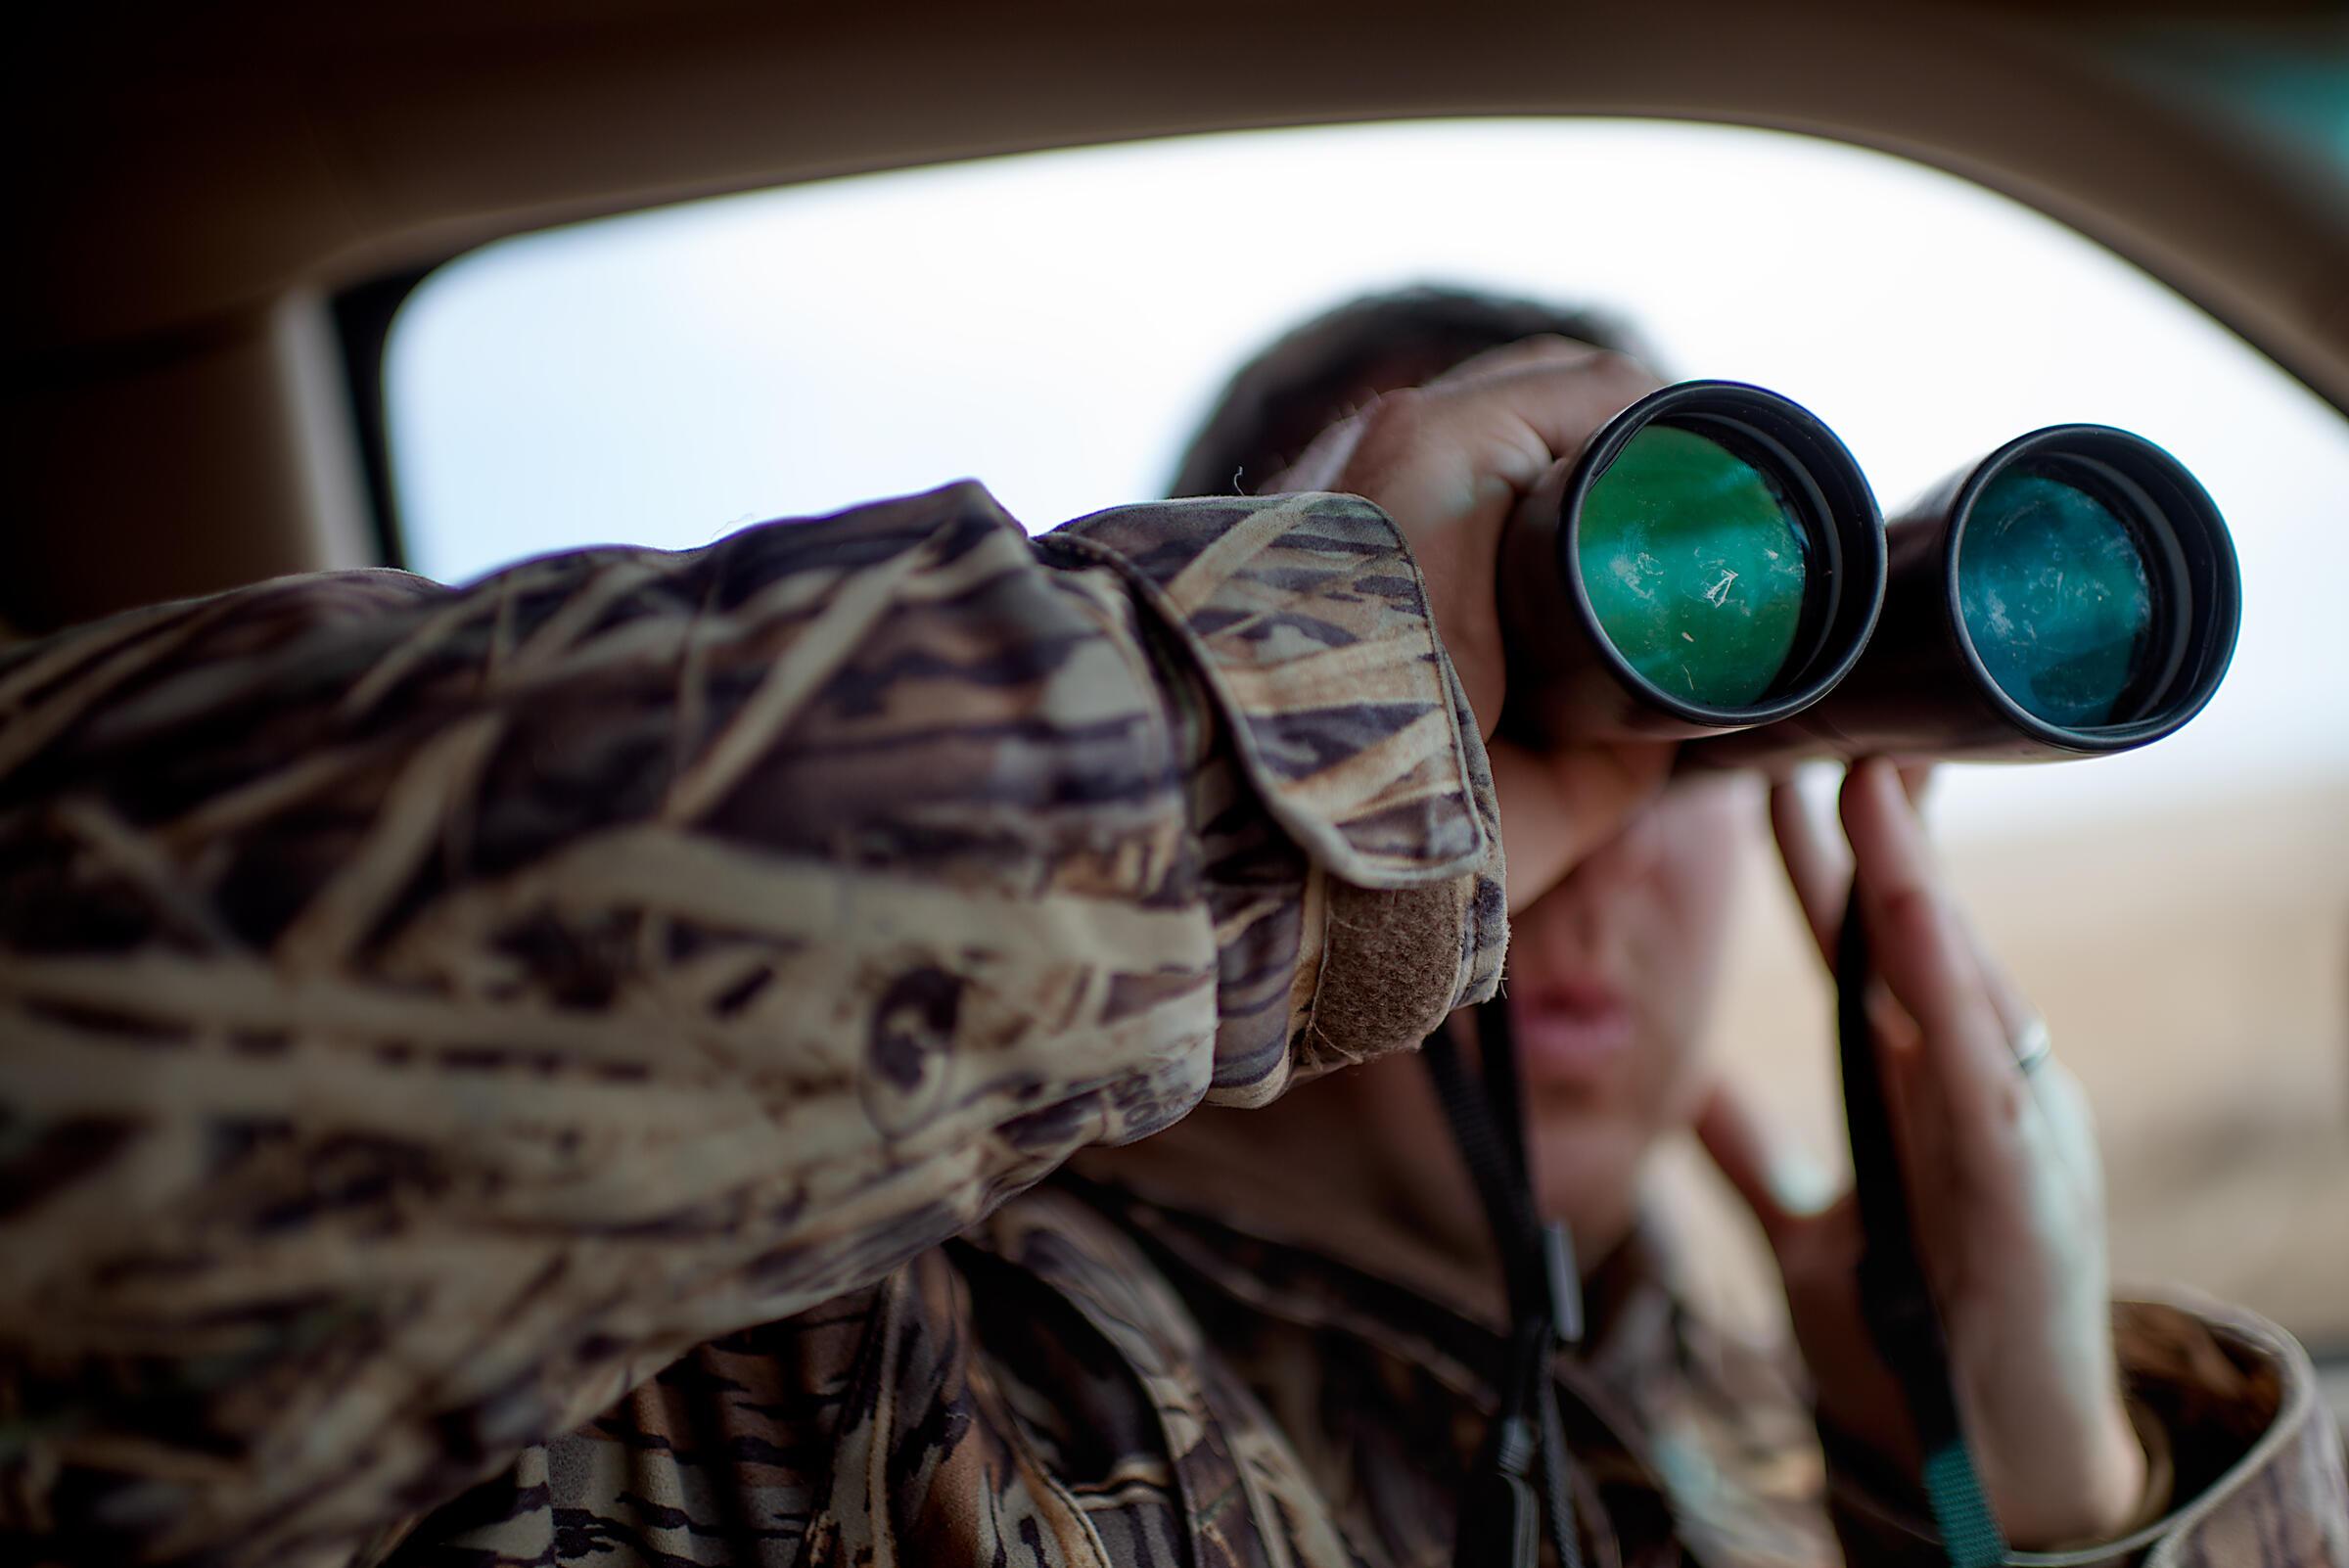 Grimm scouts the back roads near Eureka, South Dakota, for birds to photograph. Jon Lowenstein